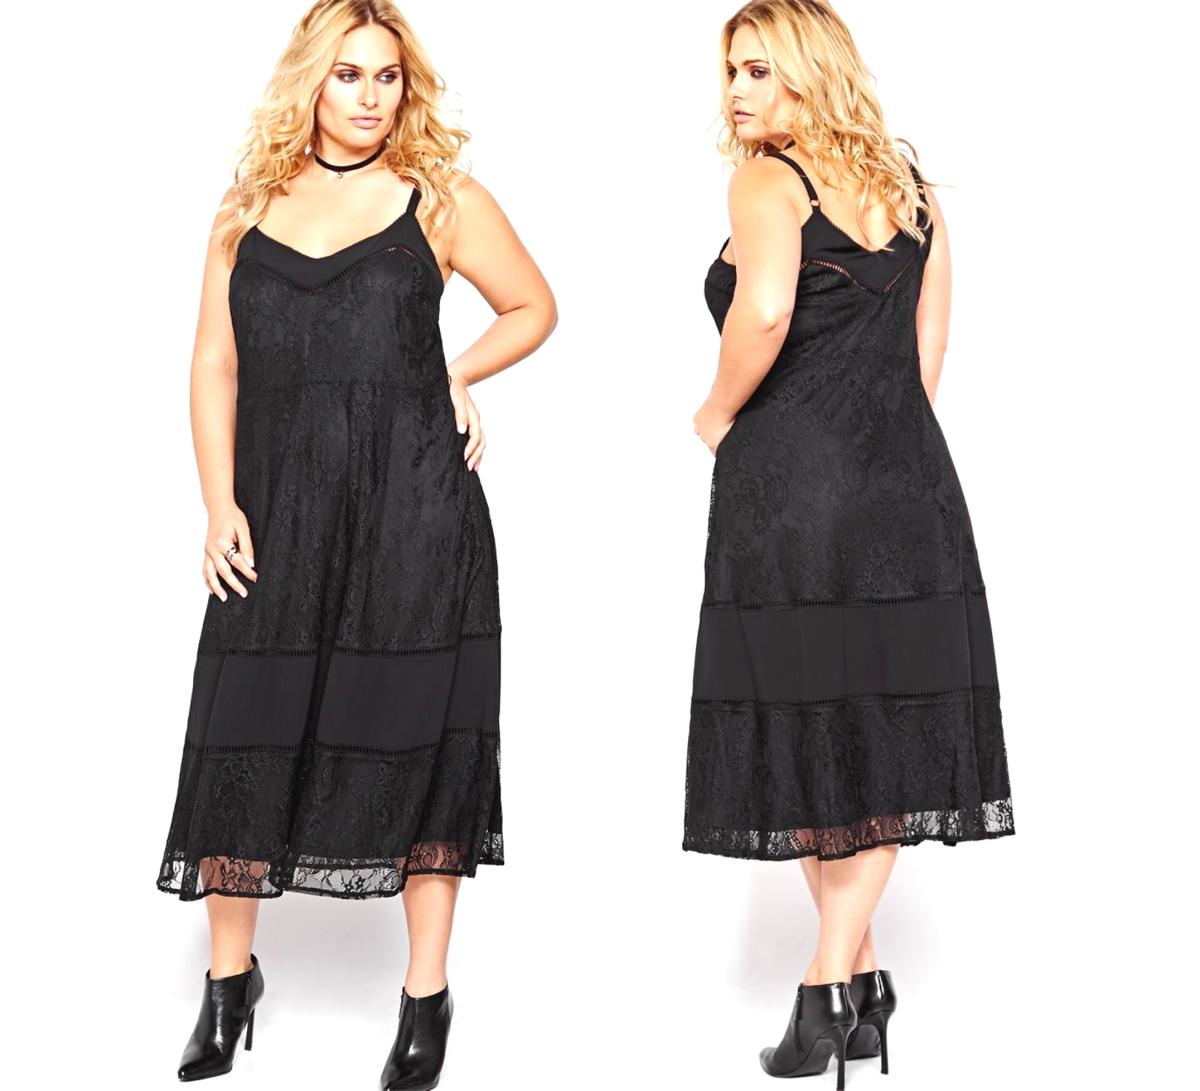 easy trendy lace slip dress: spaghetti straps, romantic lace, V-neck and back